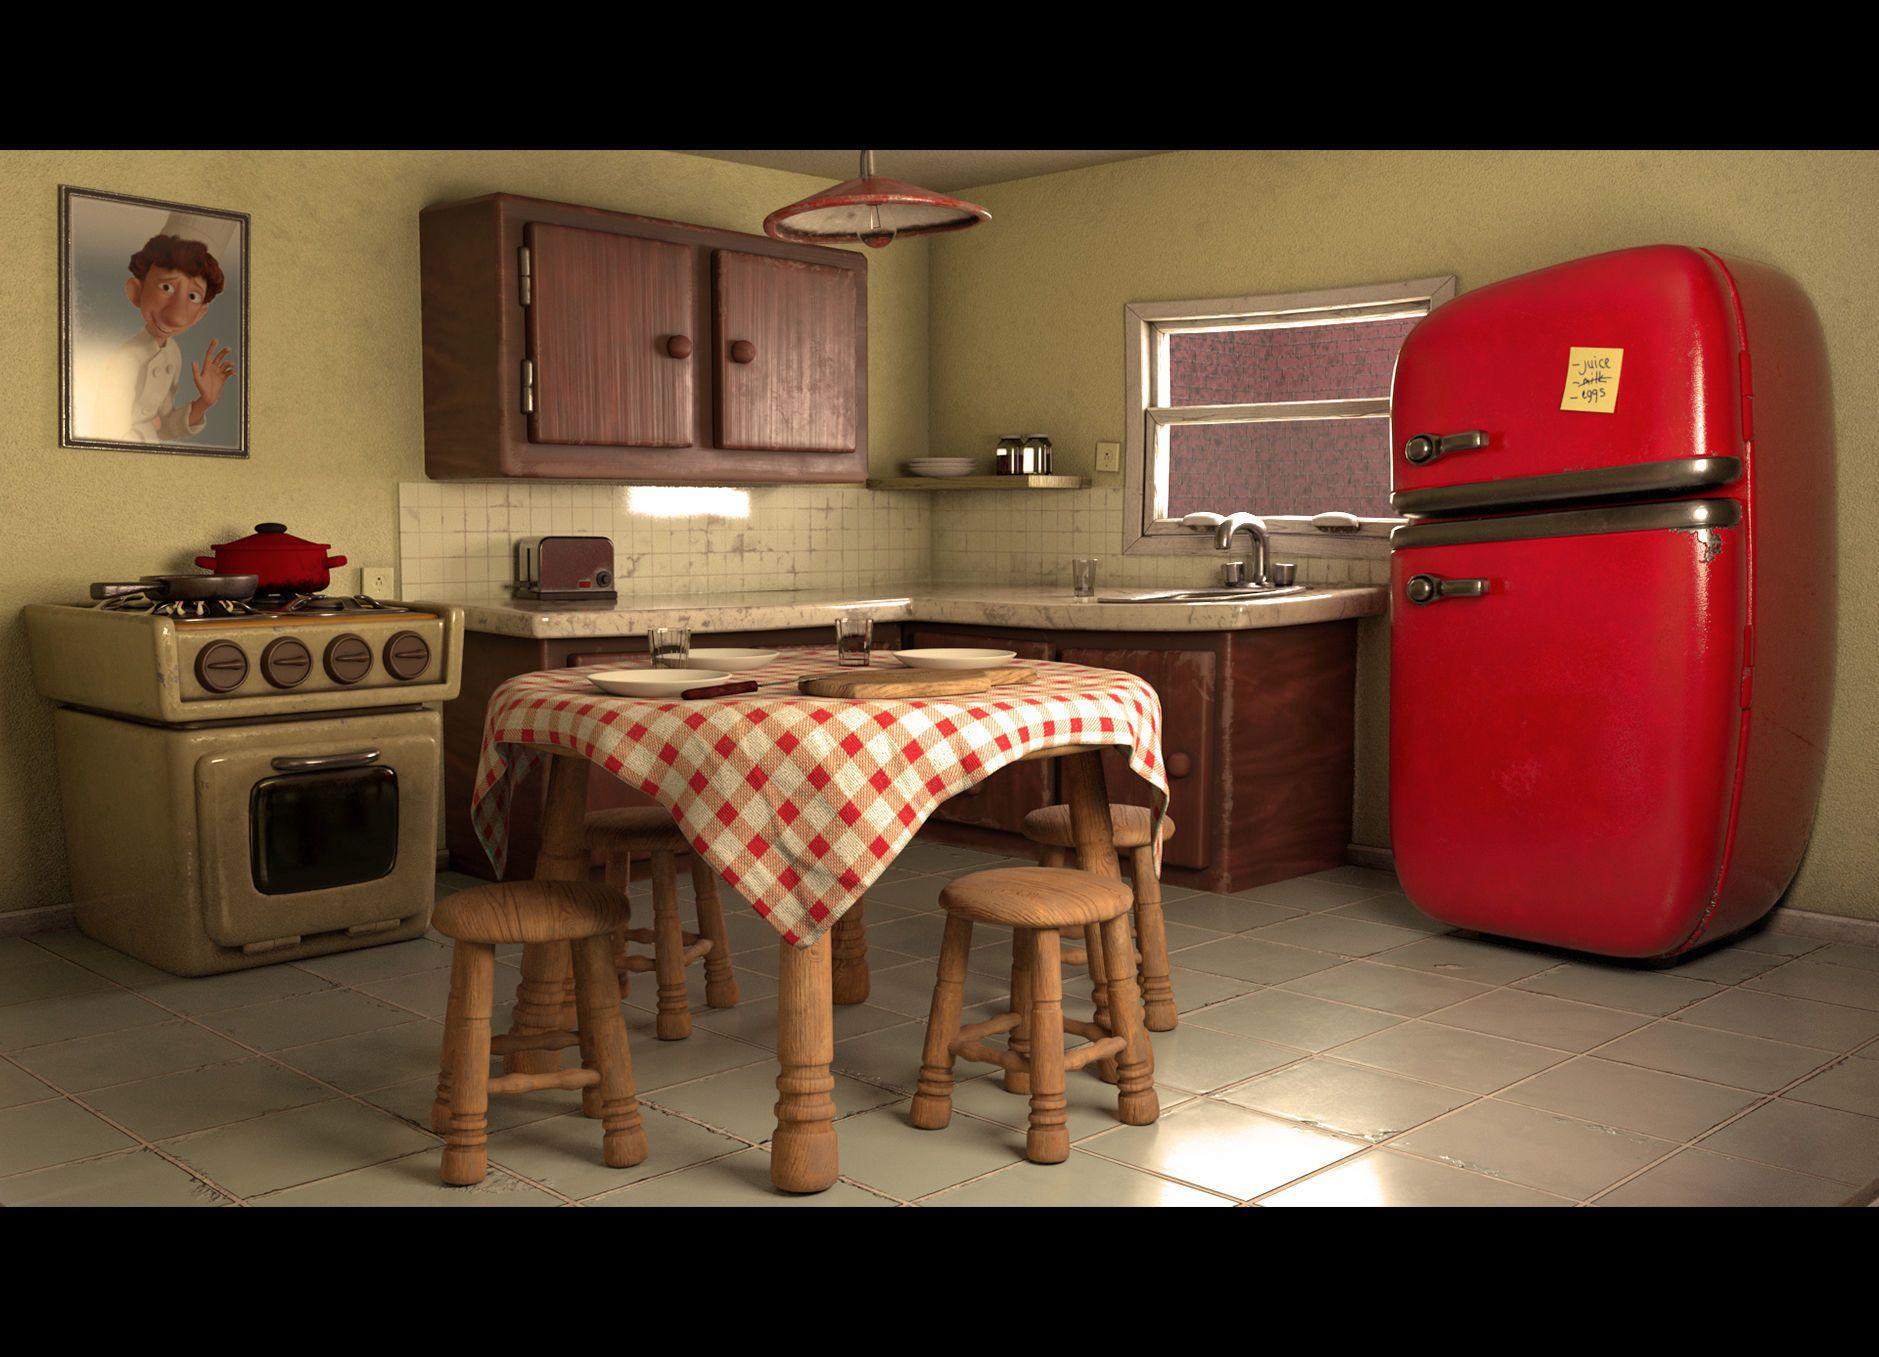 Kitchen IKEA METOD 3D model in 2020 Kitchen design